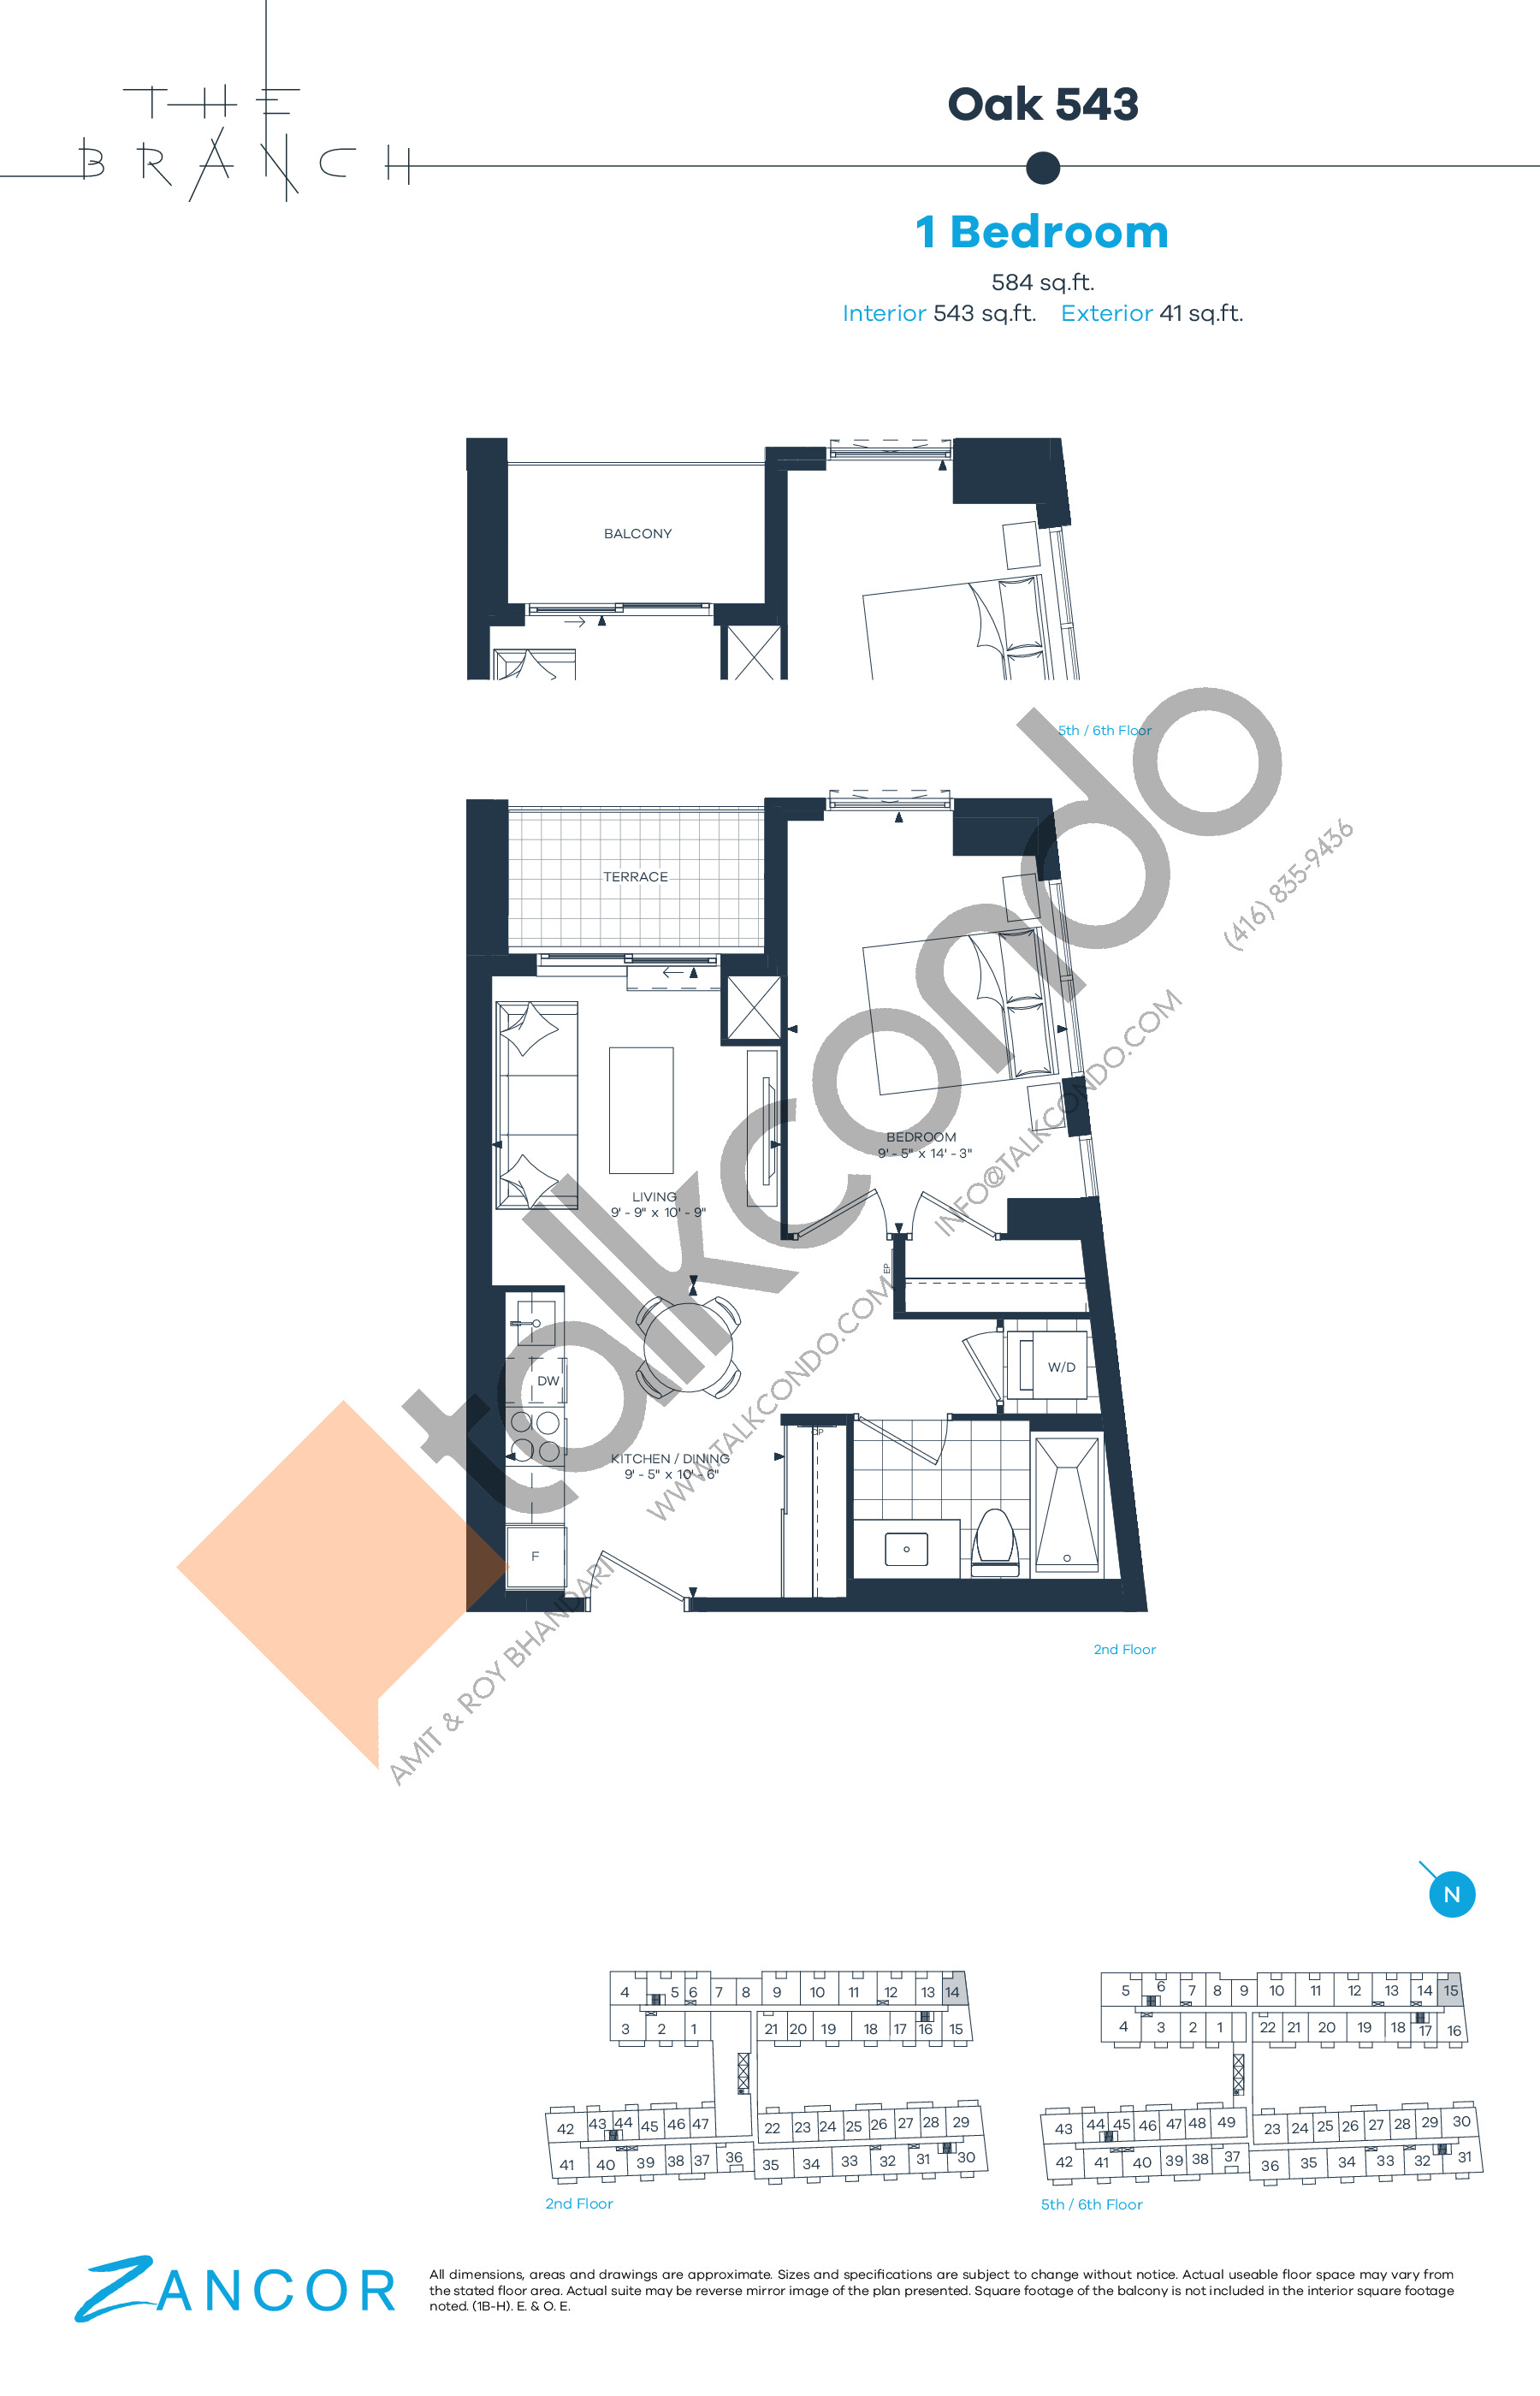 Oak 543 Floor Plan at The Branch Condos - 543 sq.ft